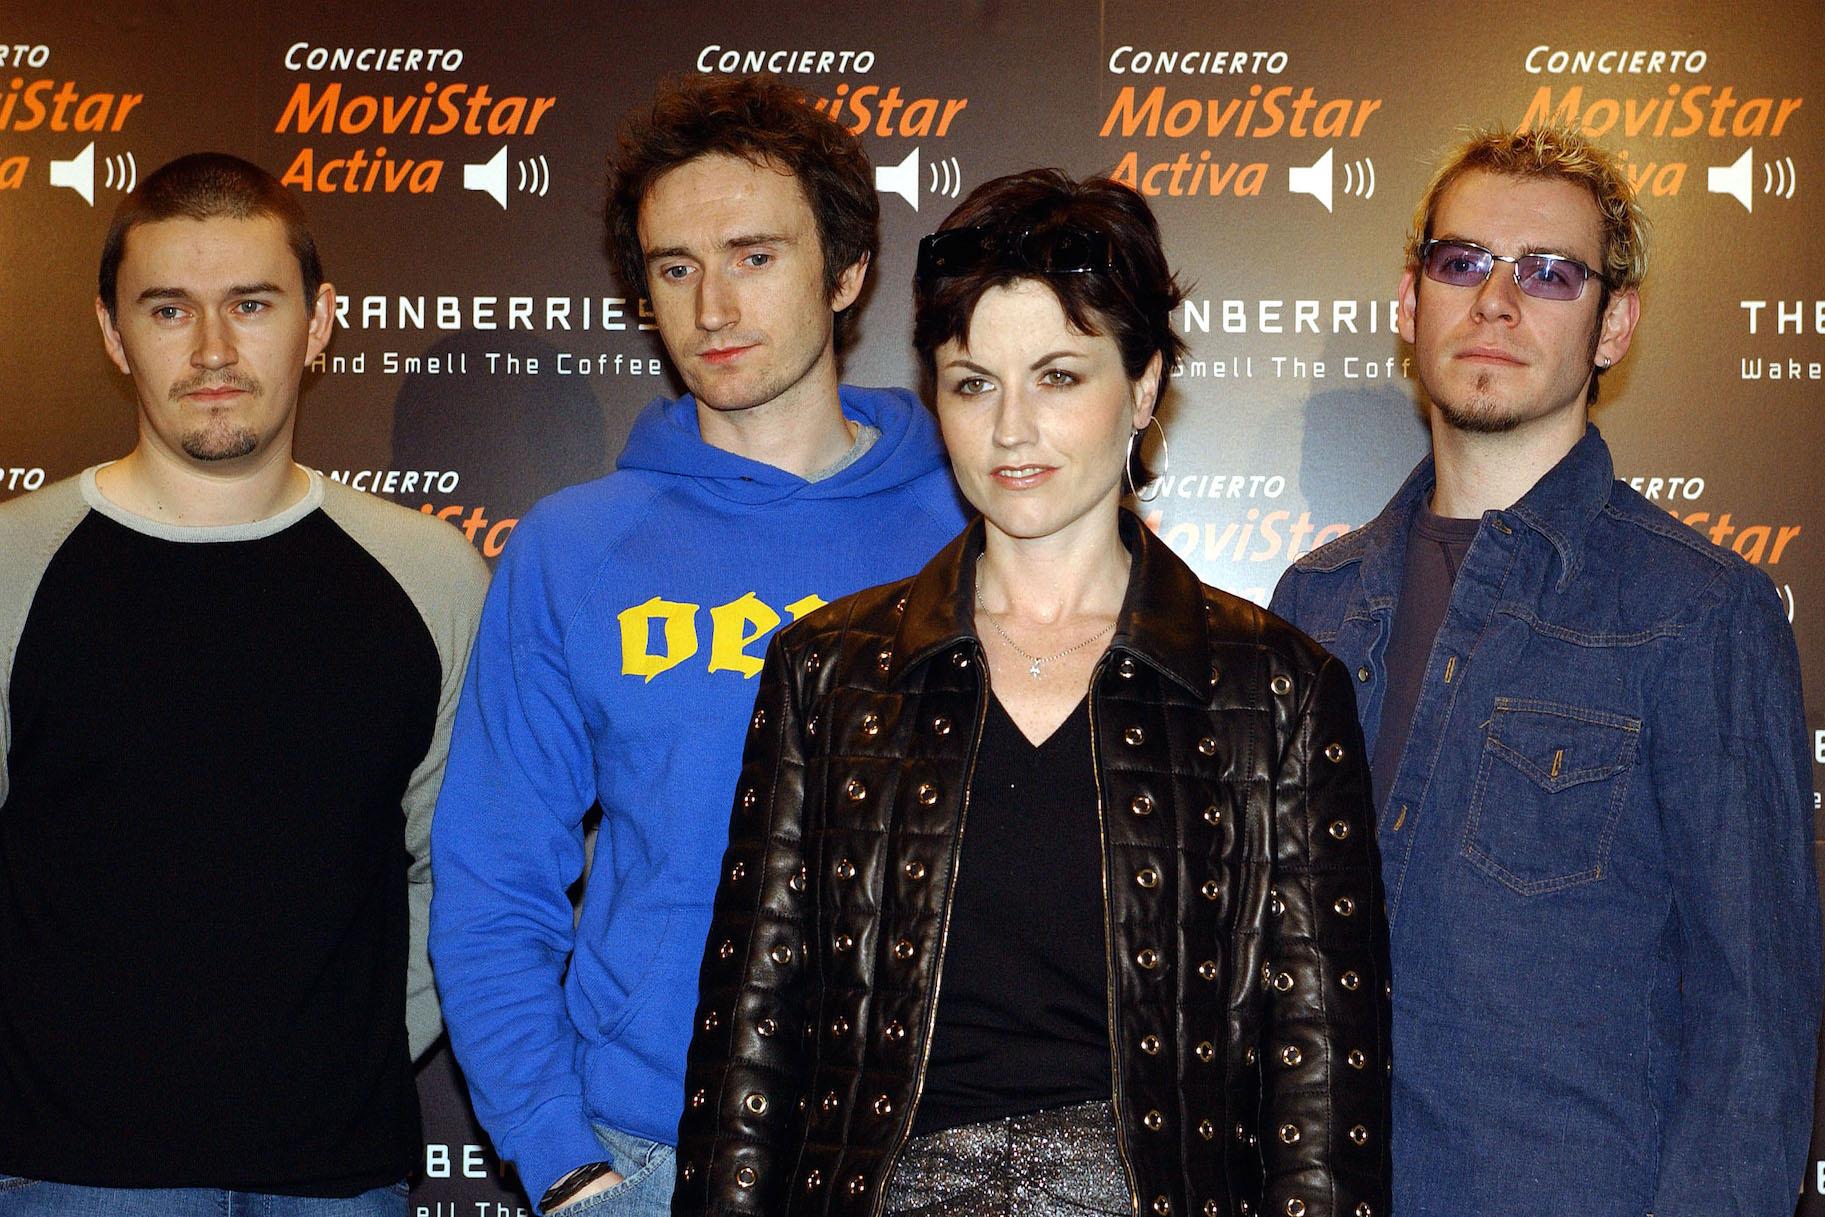 La muerte de la cantante de Cranberries Dolores O'Riordan fue considerada accidental